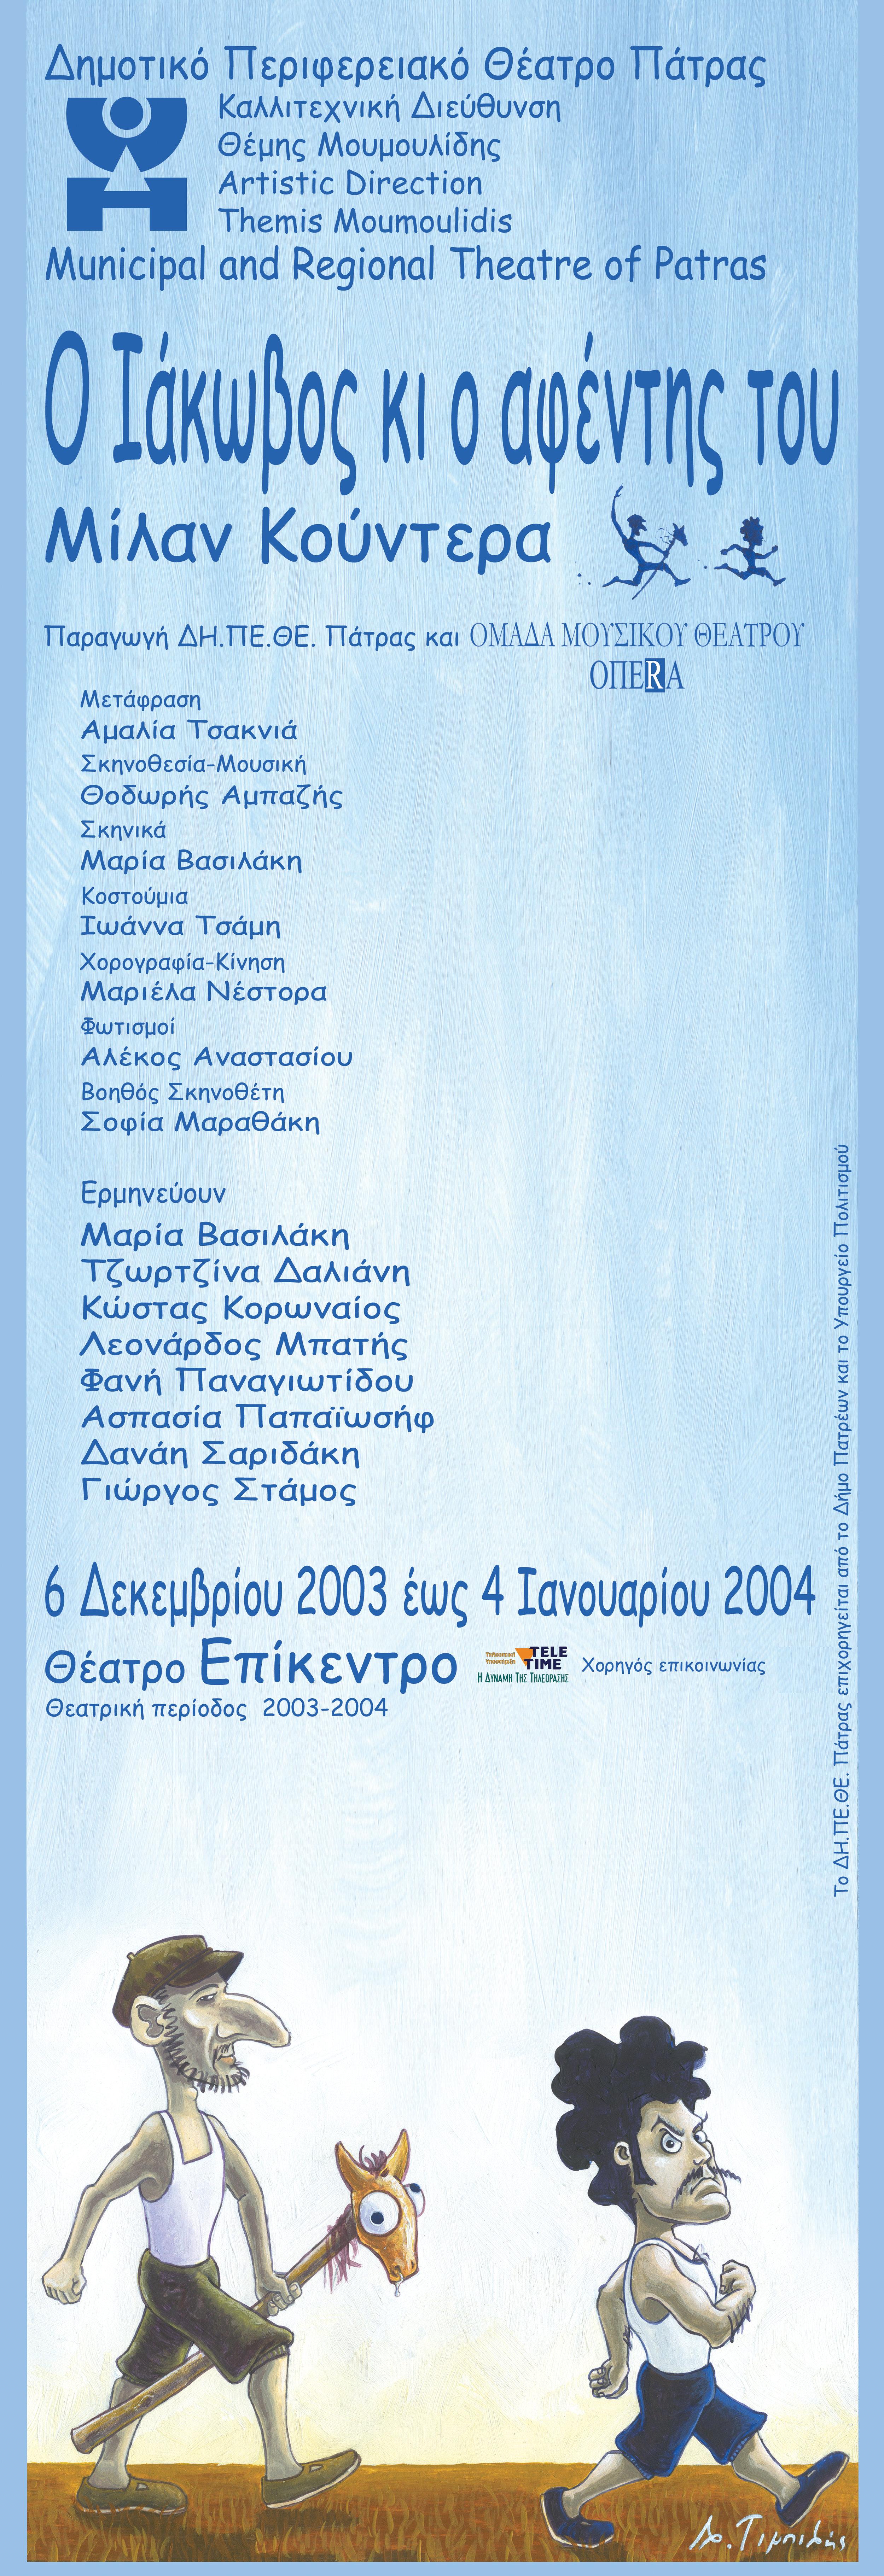 2003 Jacques and his Master by Milan Kundera Poster.jpg